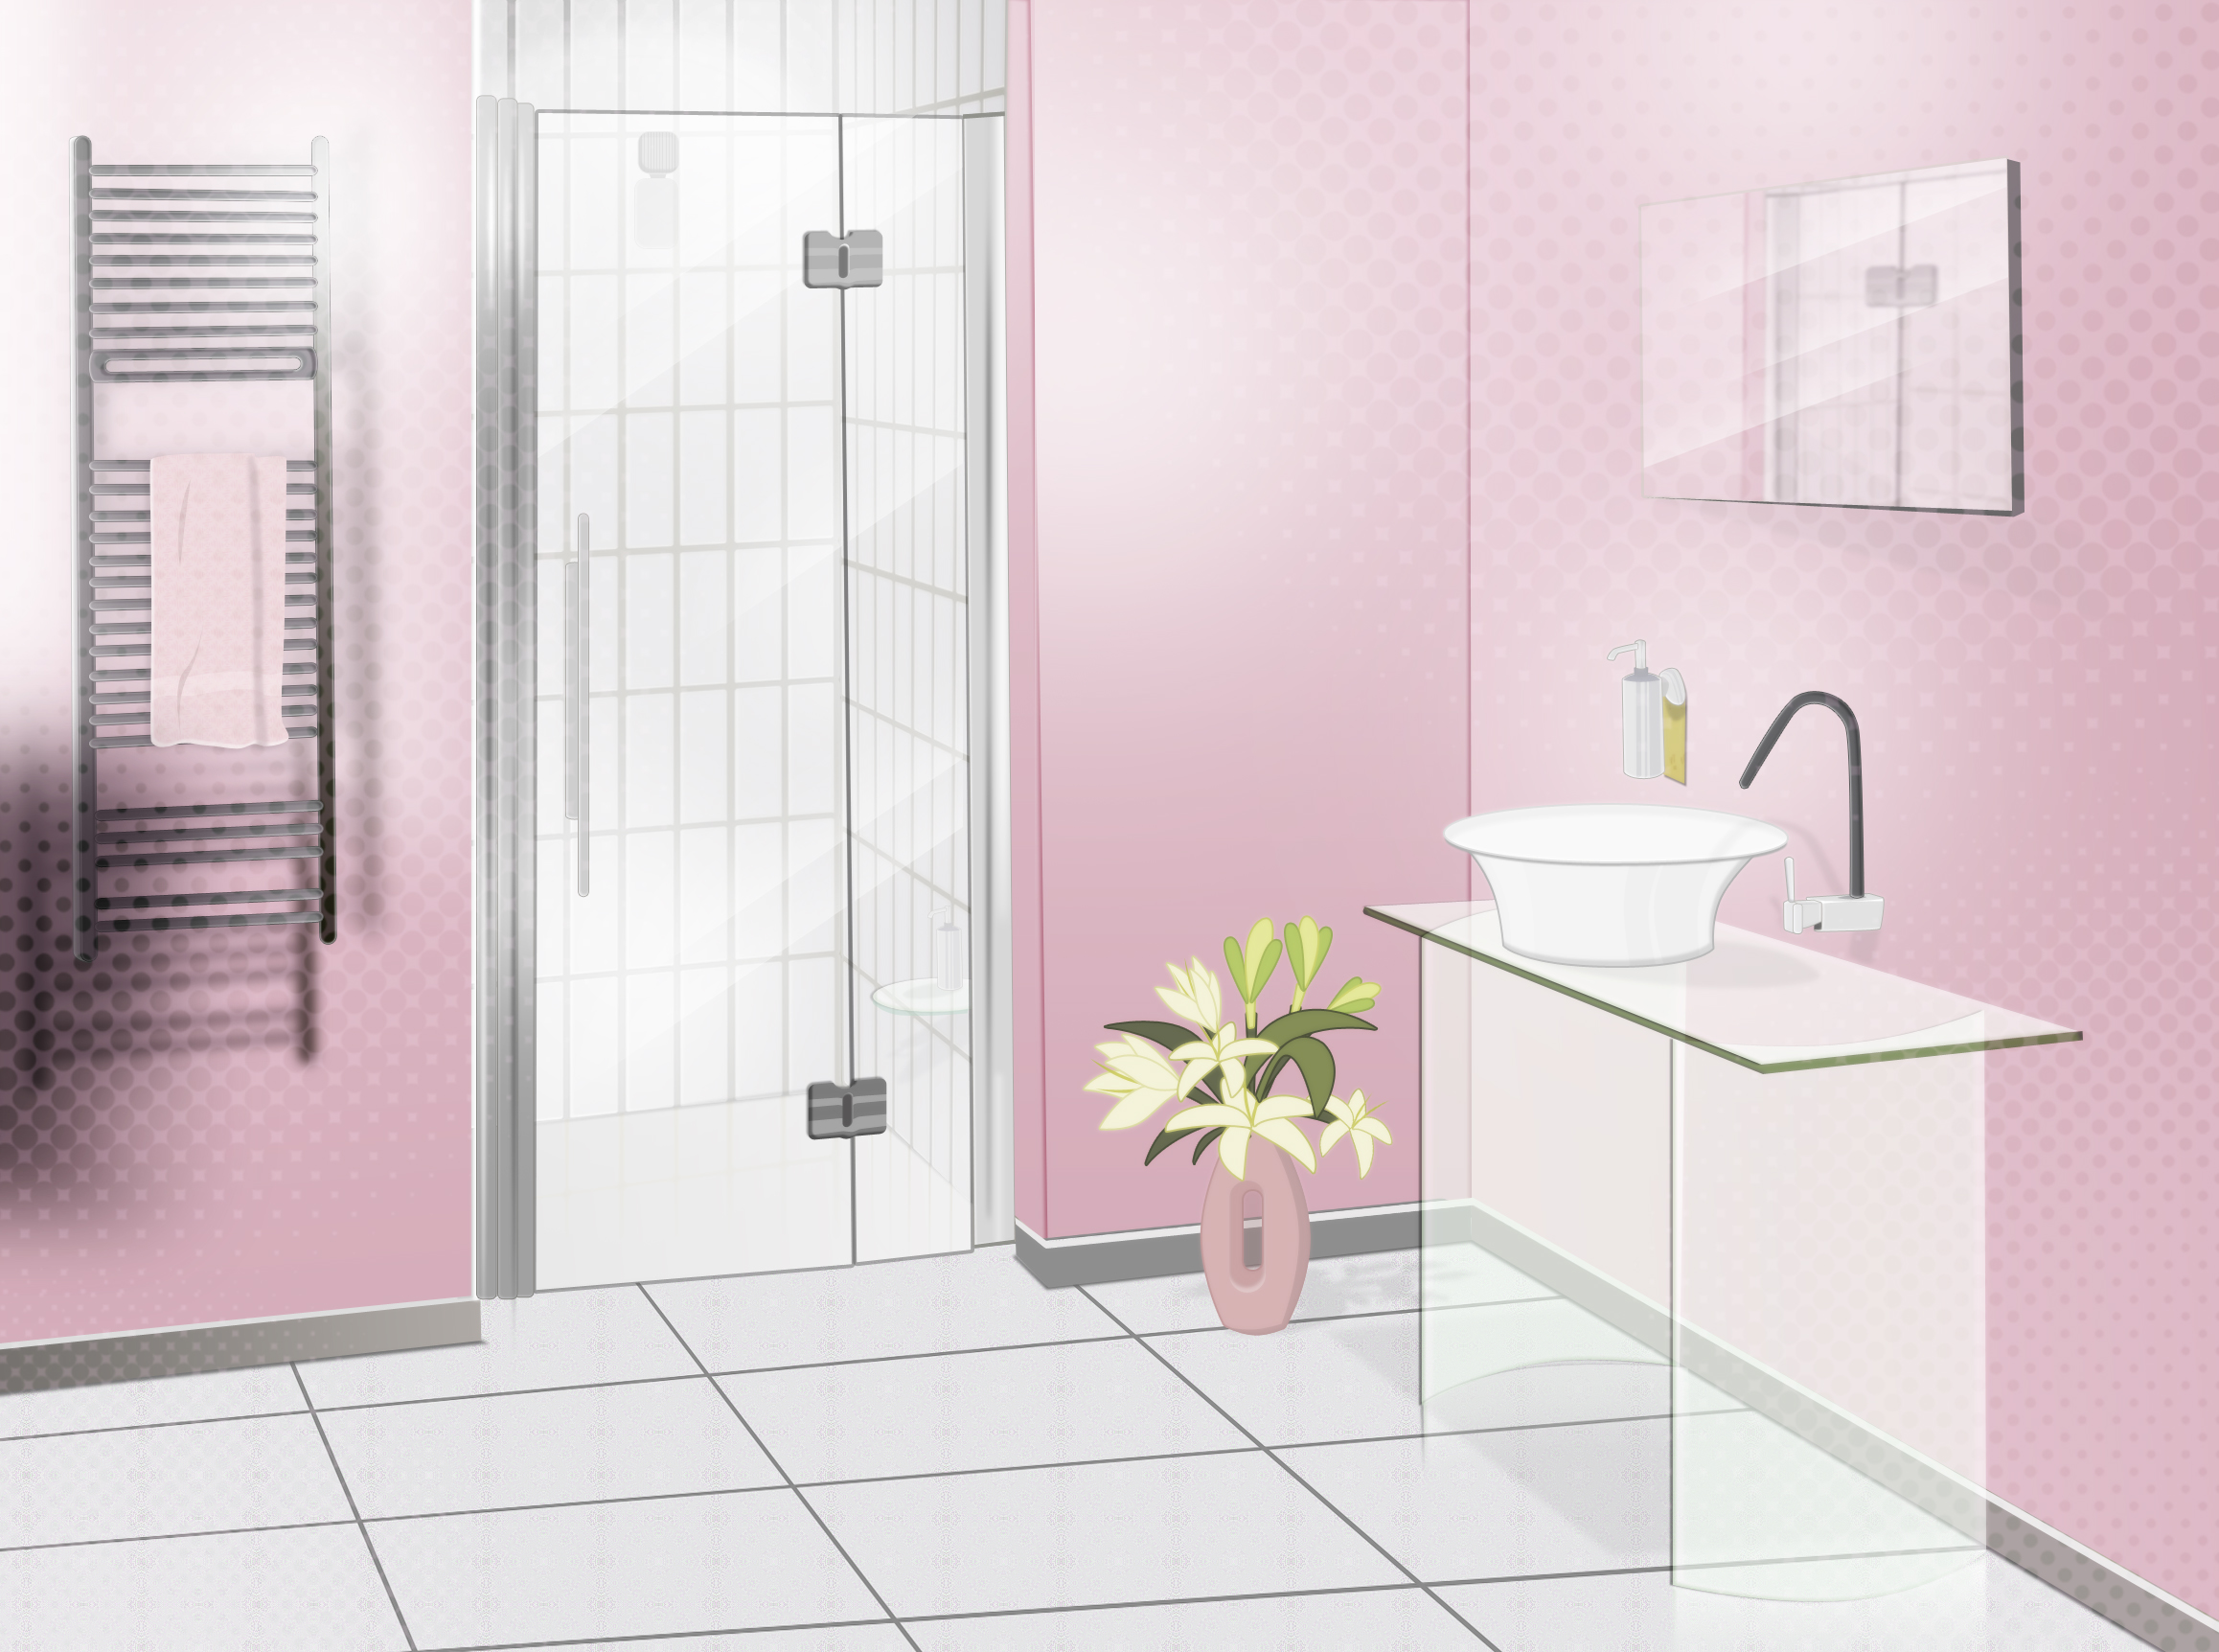 Bathroom Vector by UsuiNyaNya Bathroom Vector by UsuiNyaNya  Black Ants In  Bathroom. Bathroom Dreams